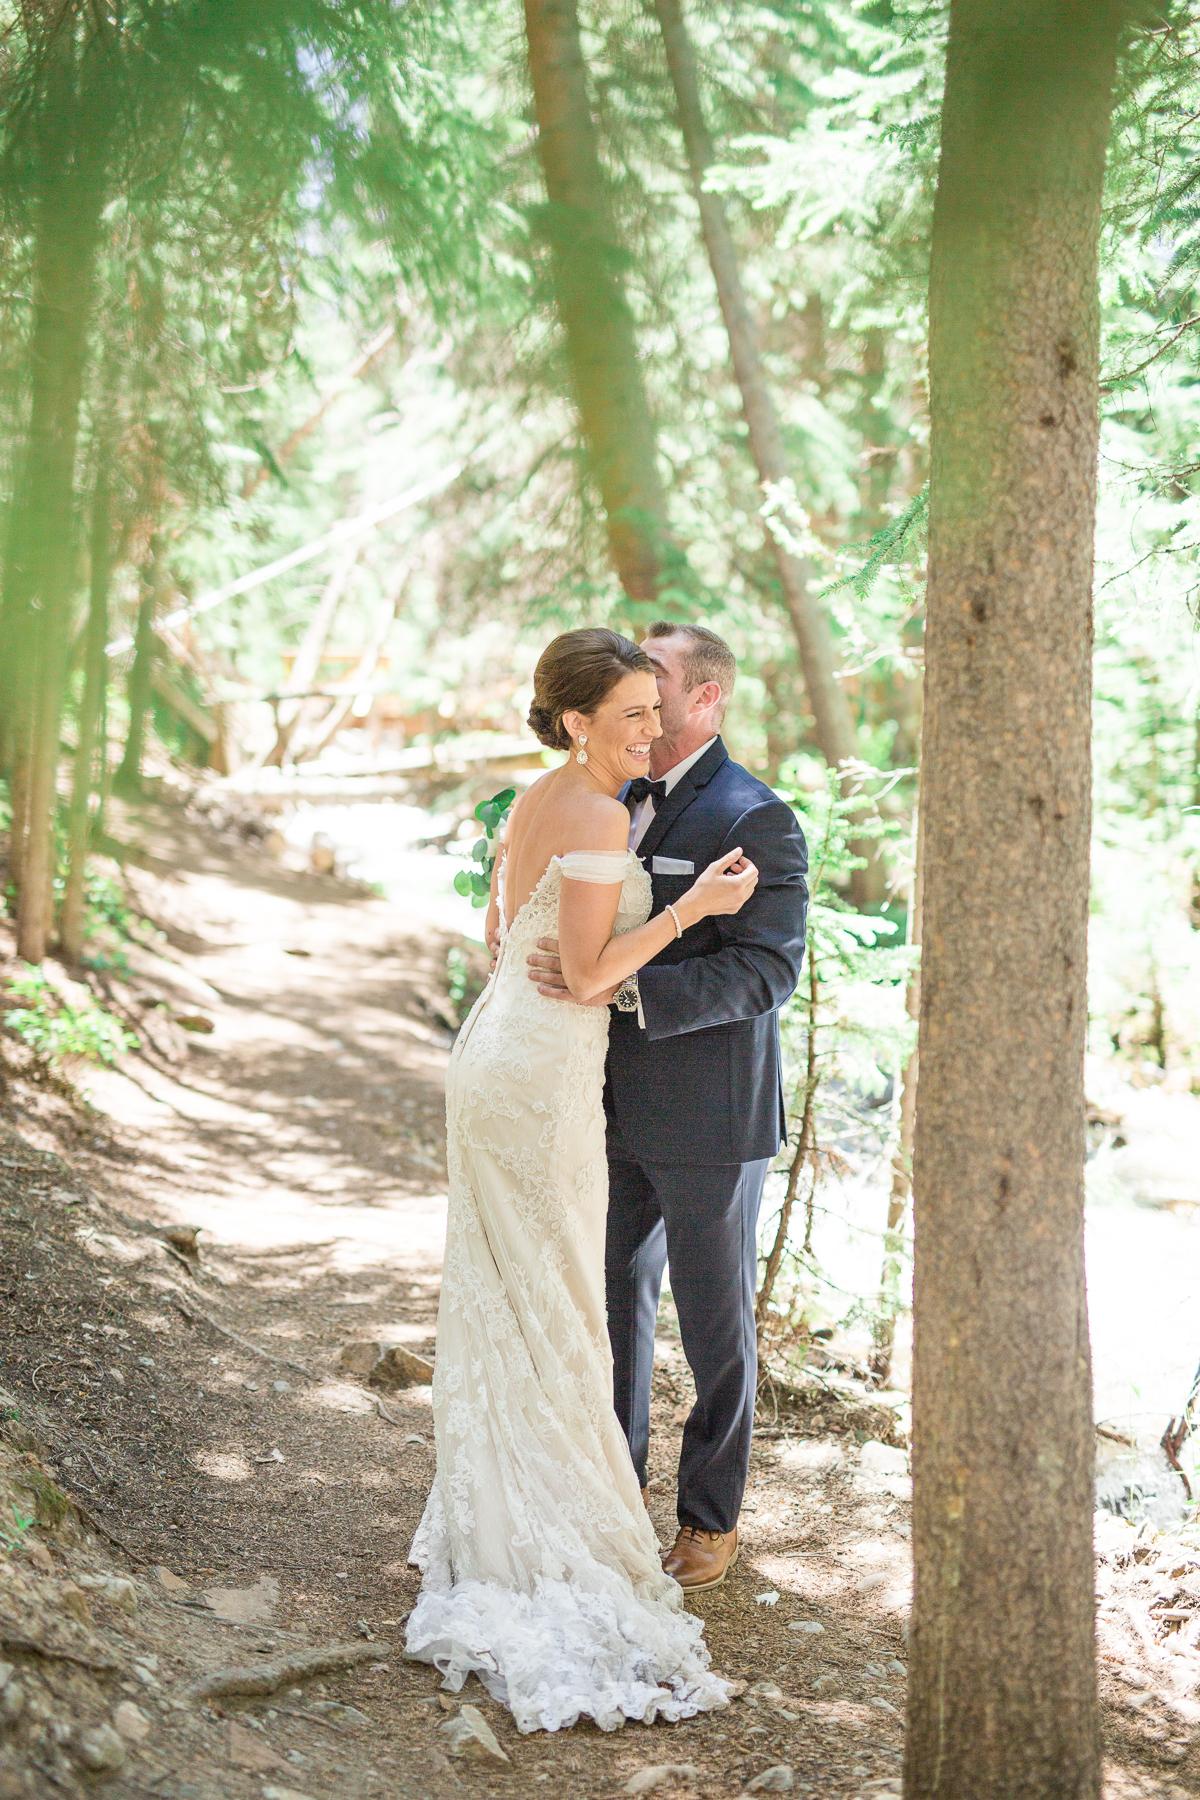 StaciDesign-Colorado-Wedding-3873.jpg